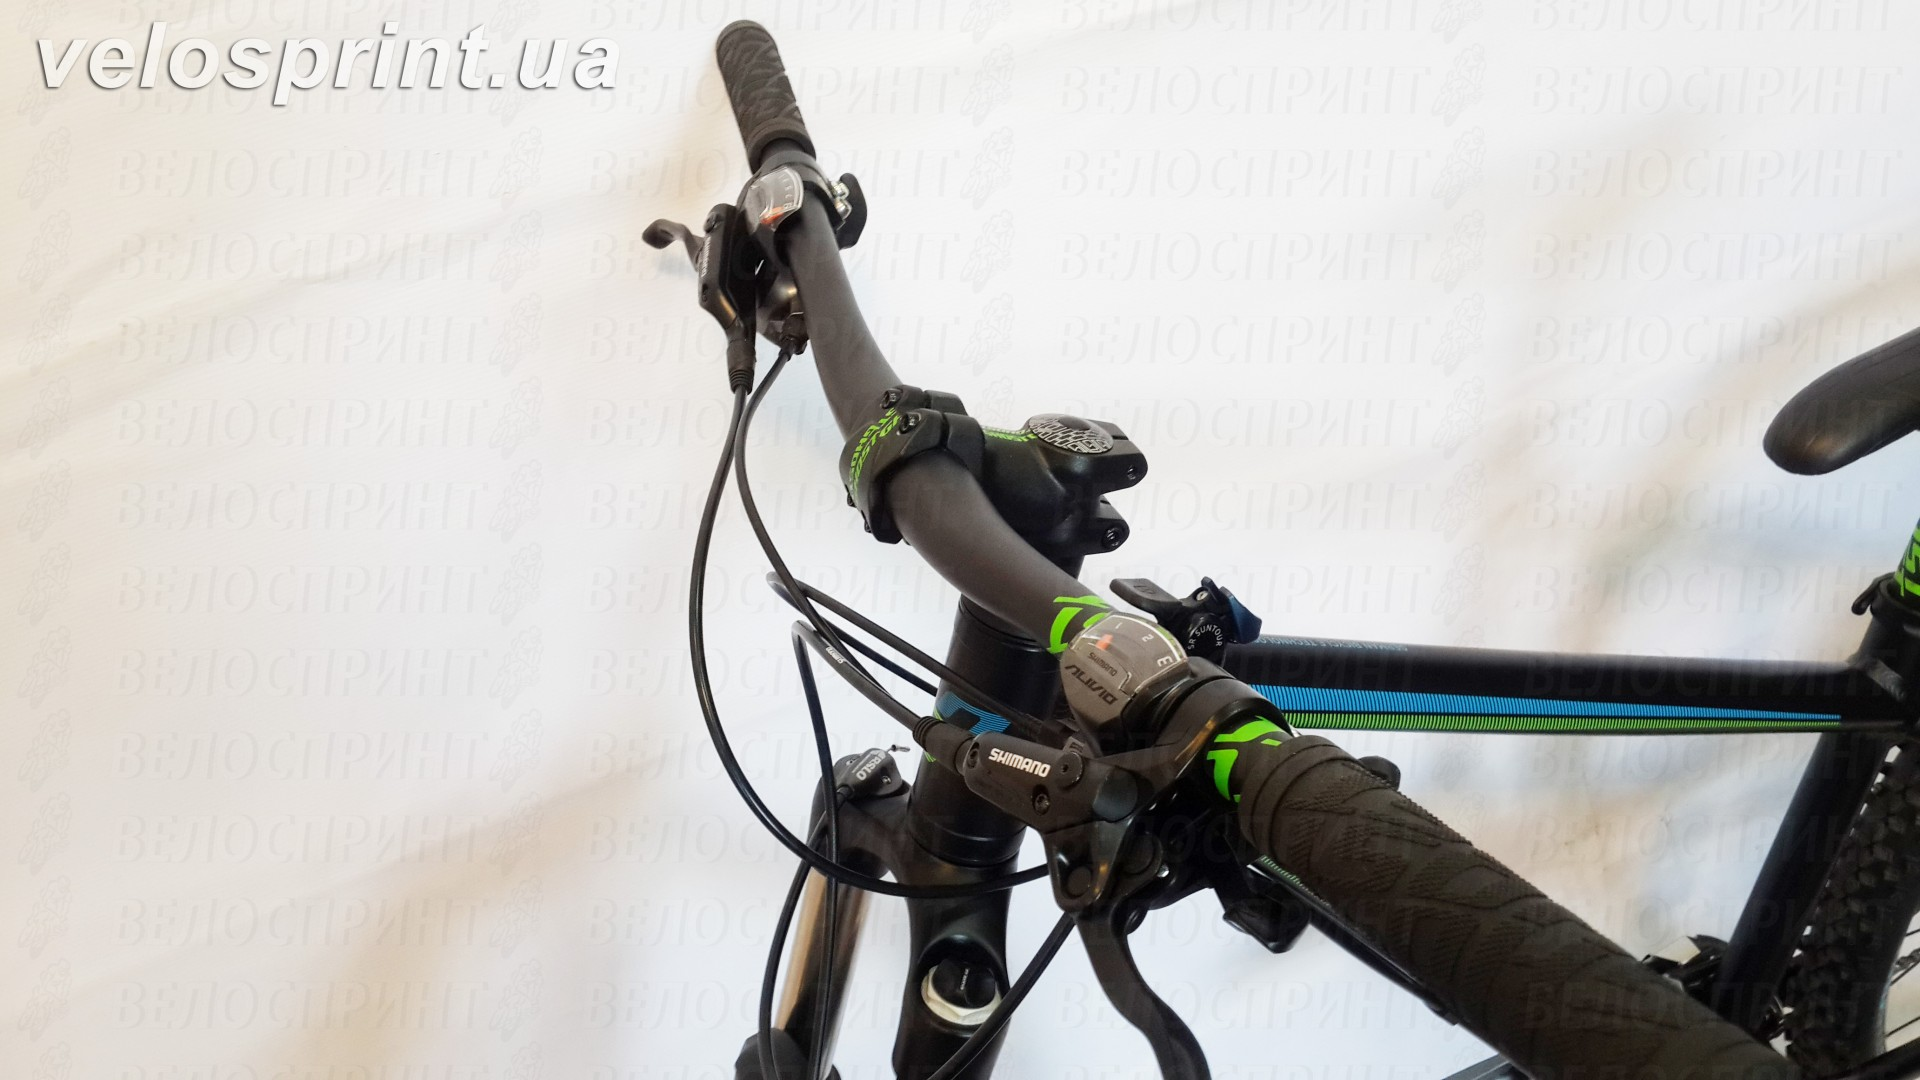 Велосипед GHOST Kato 4 black/green/blue тормозные ручки год 2016